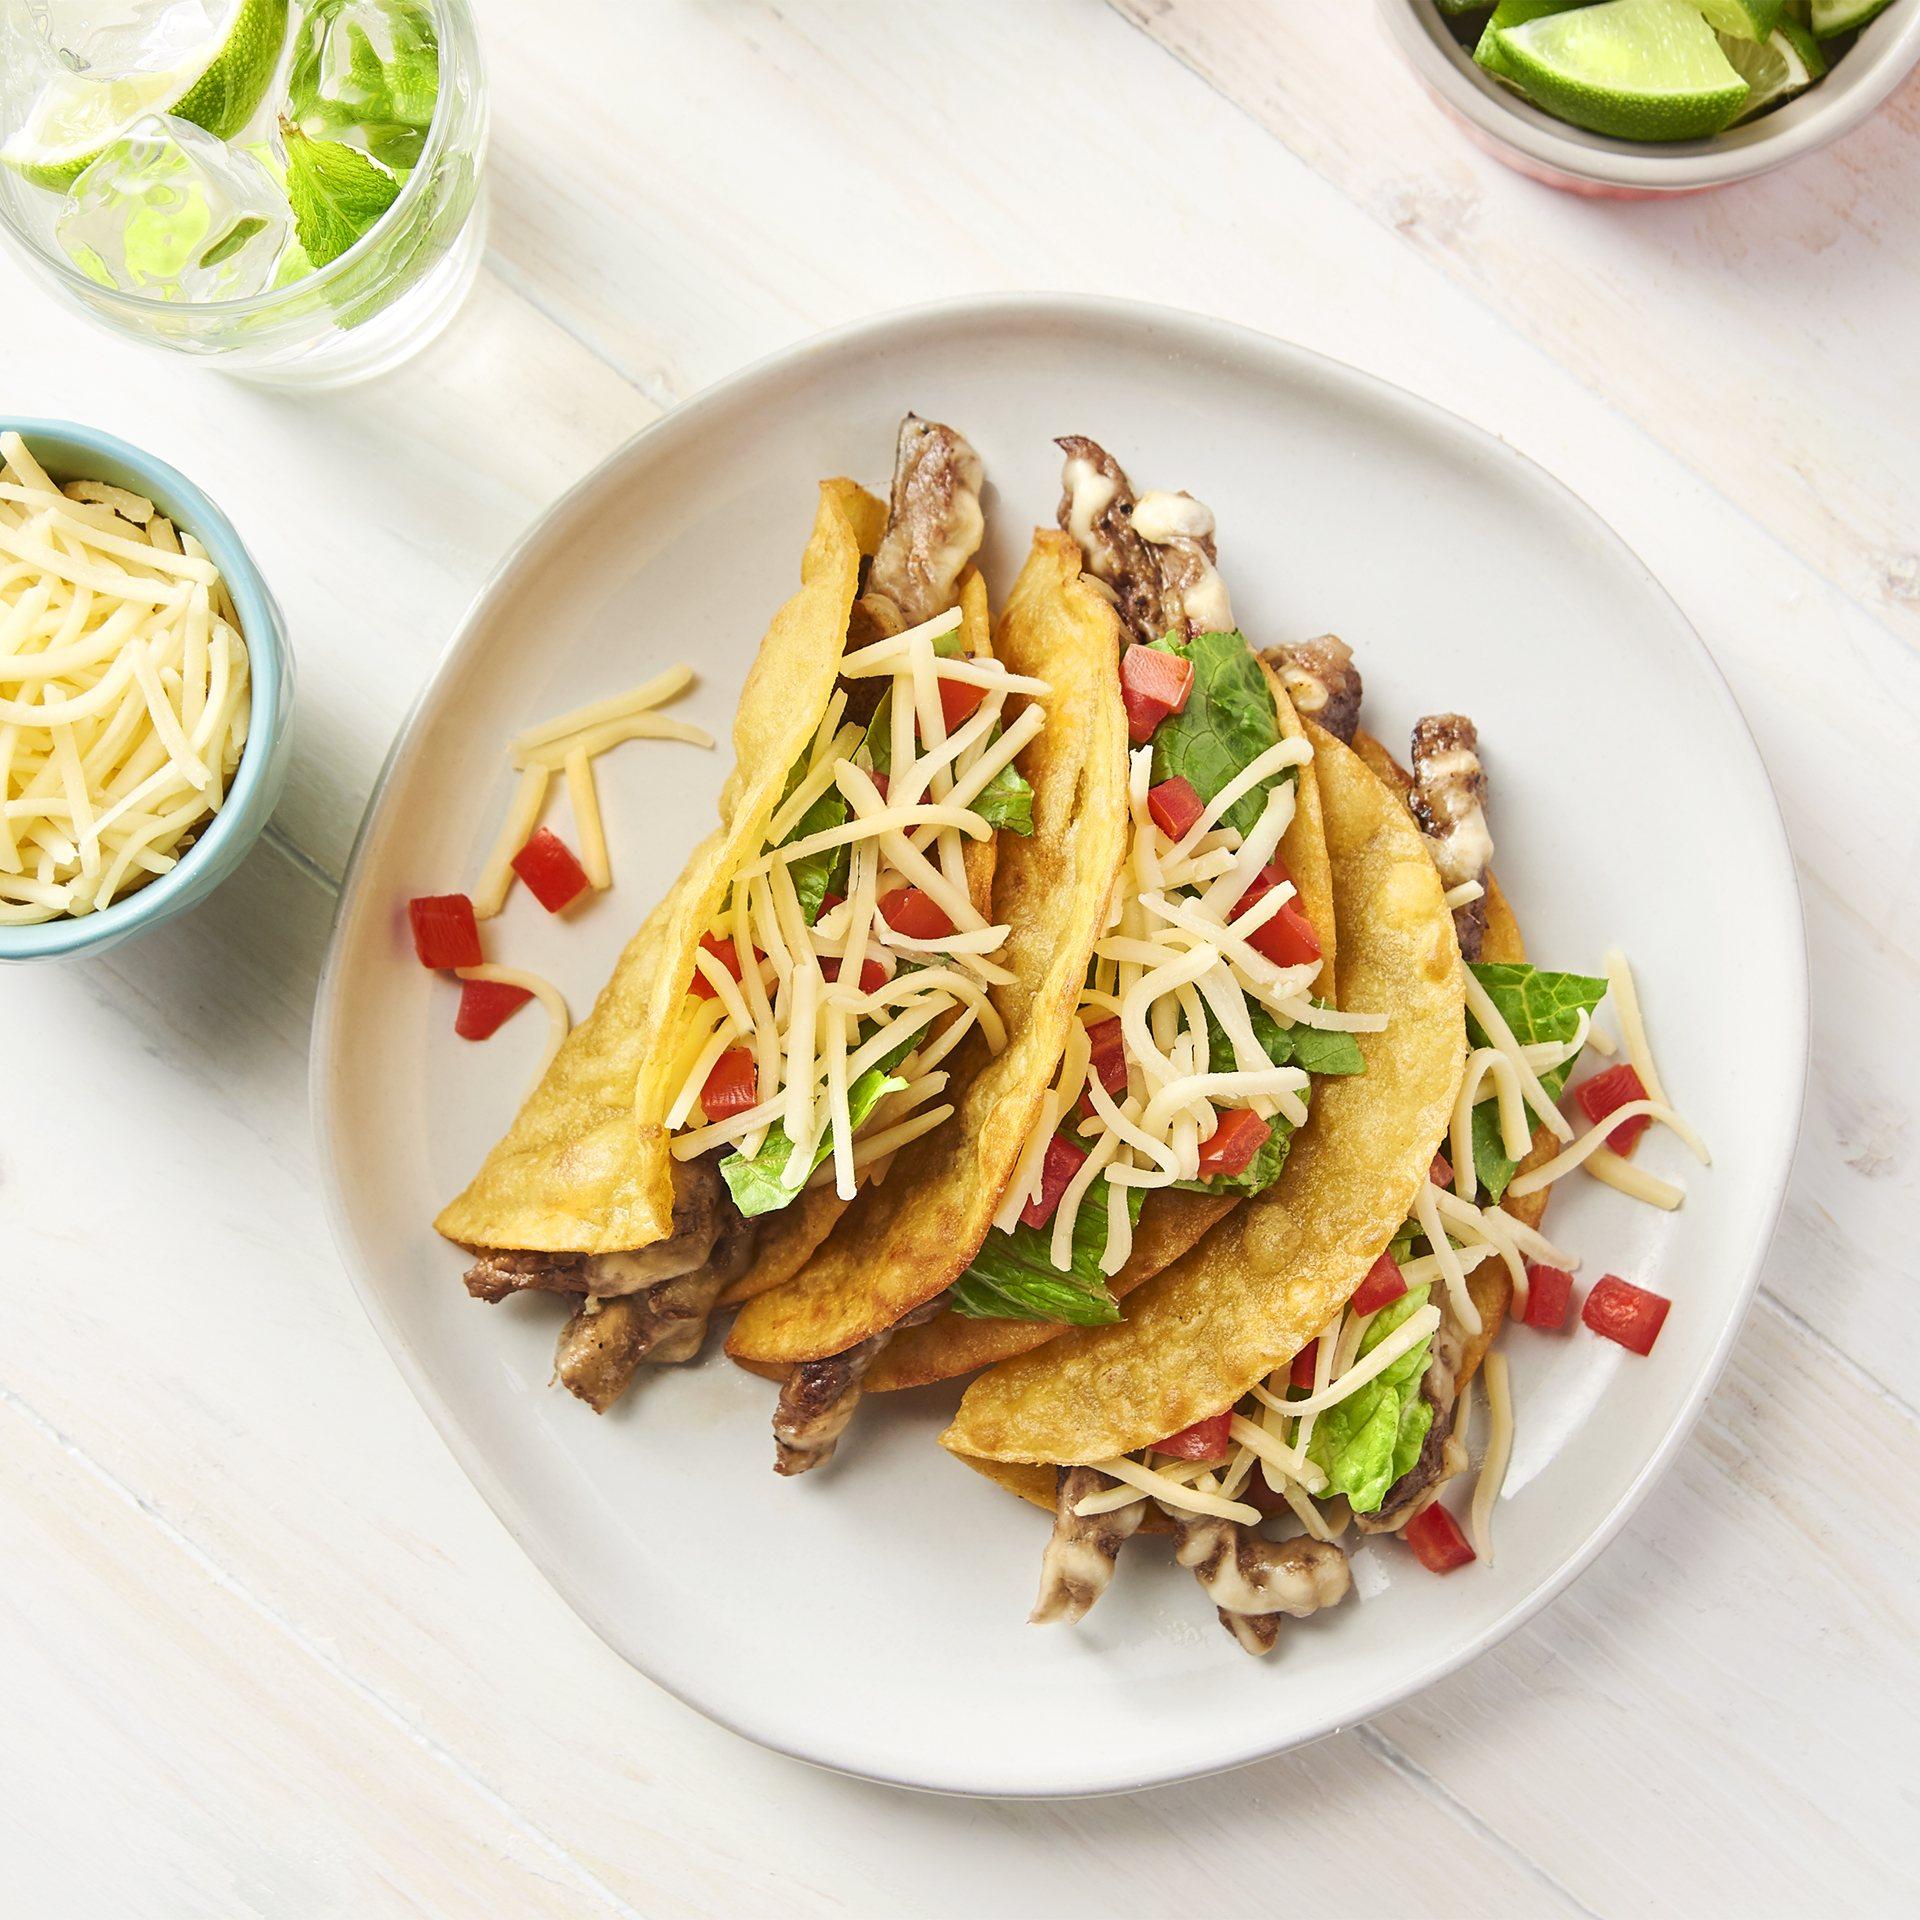 Crunchy Steak Tacos